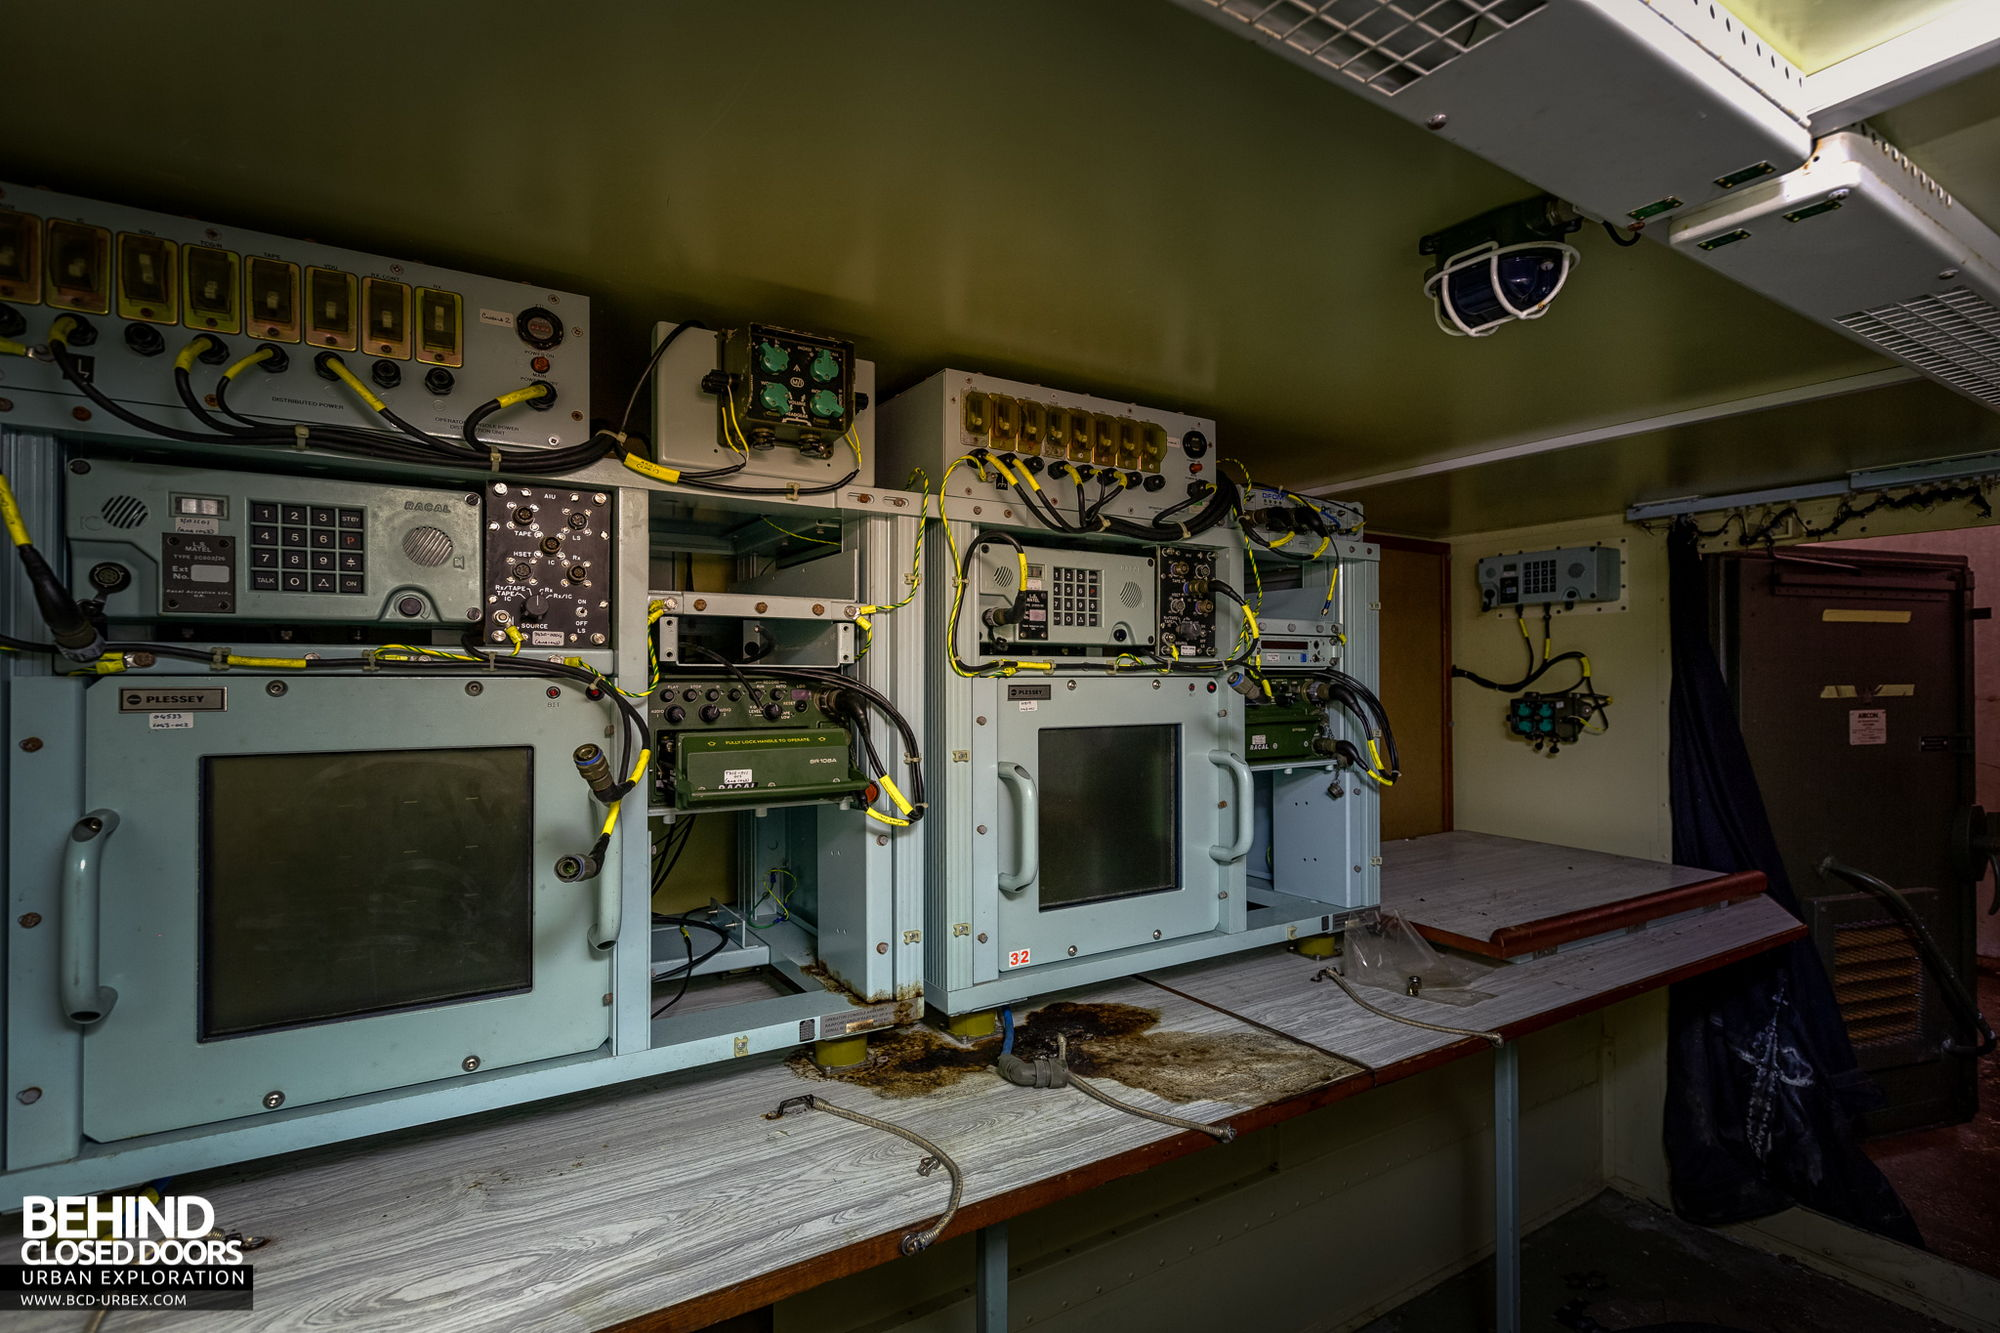 raf-coningsby-bomb-store-47.jpg